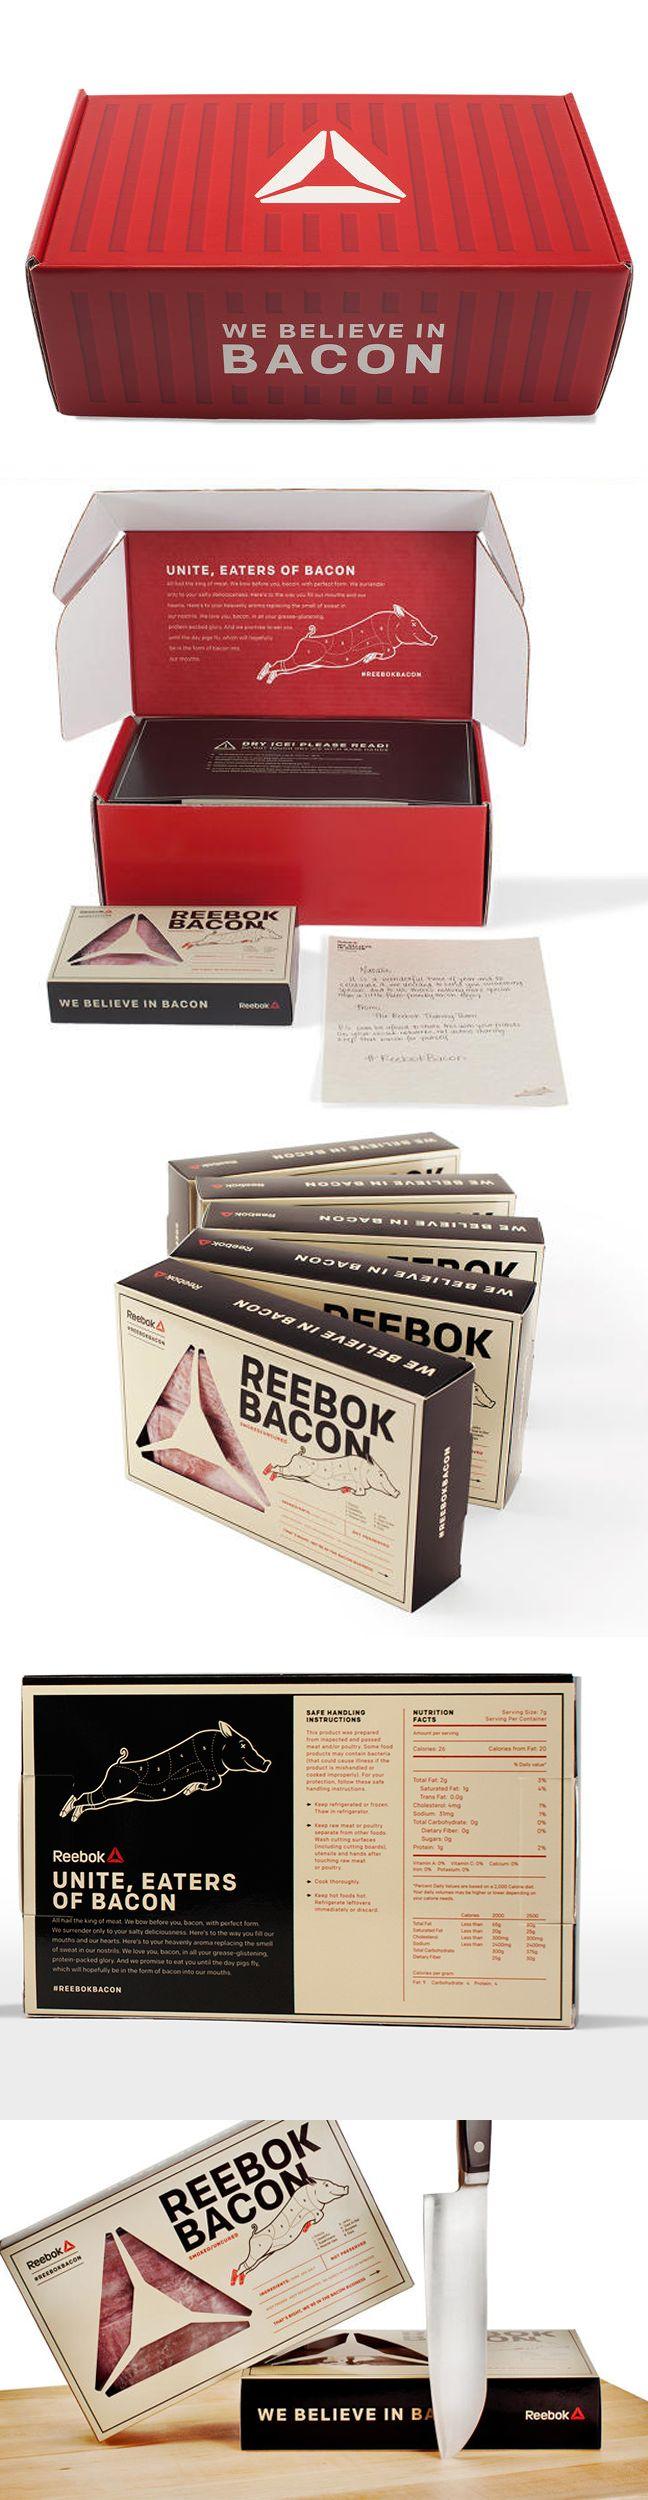 #RebookBacon - Crossfit Social influencer marketing at Crossfit Games 2014